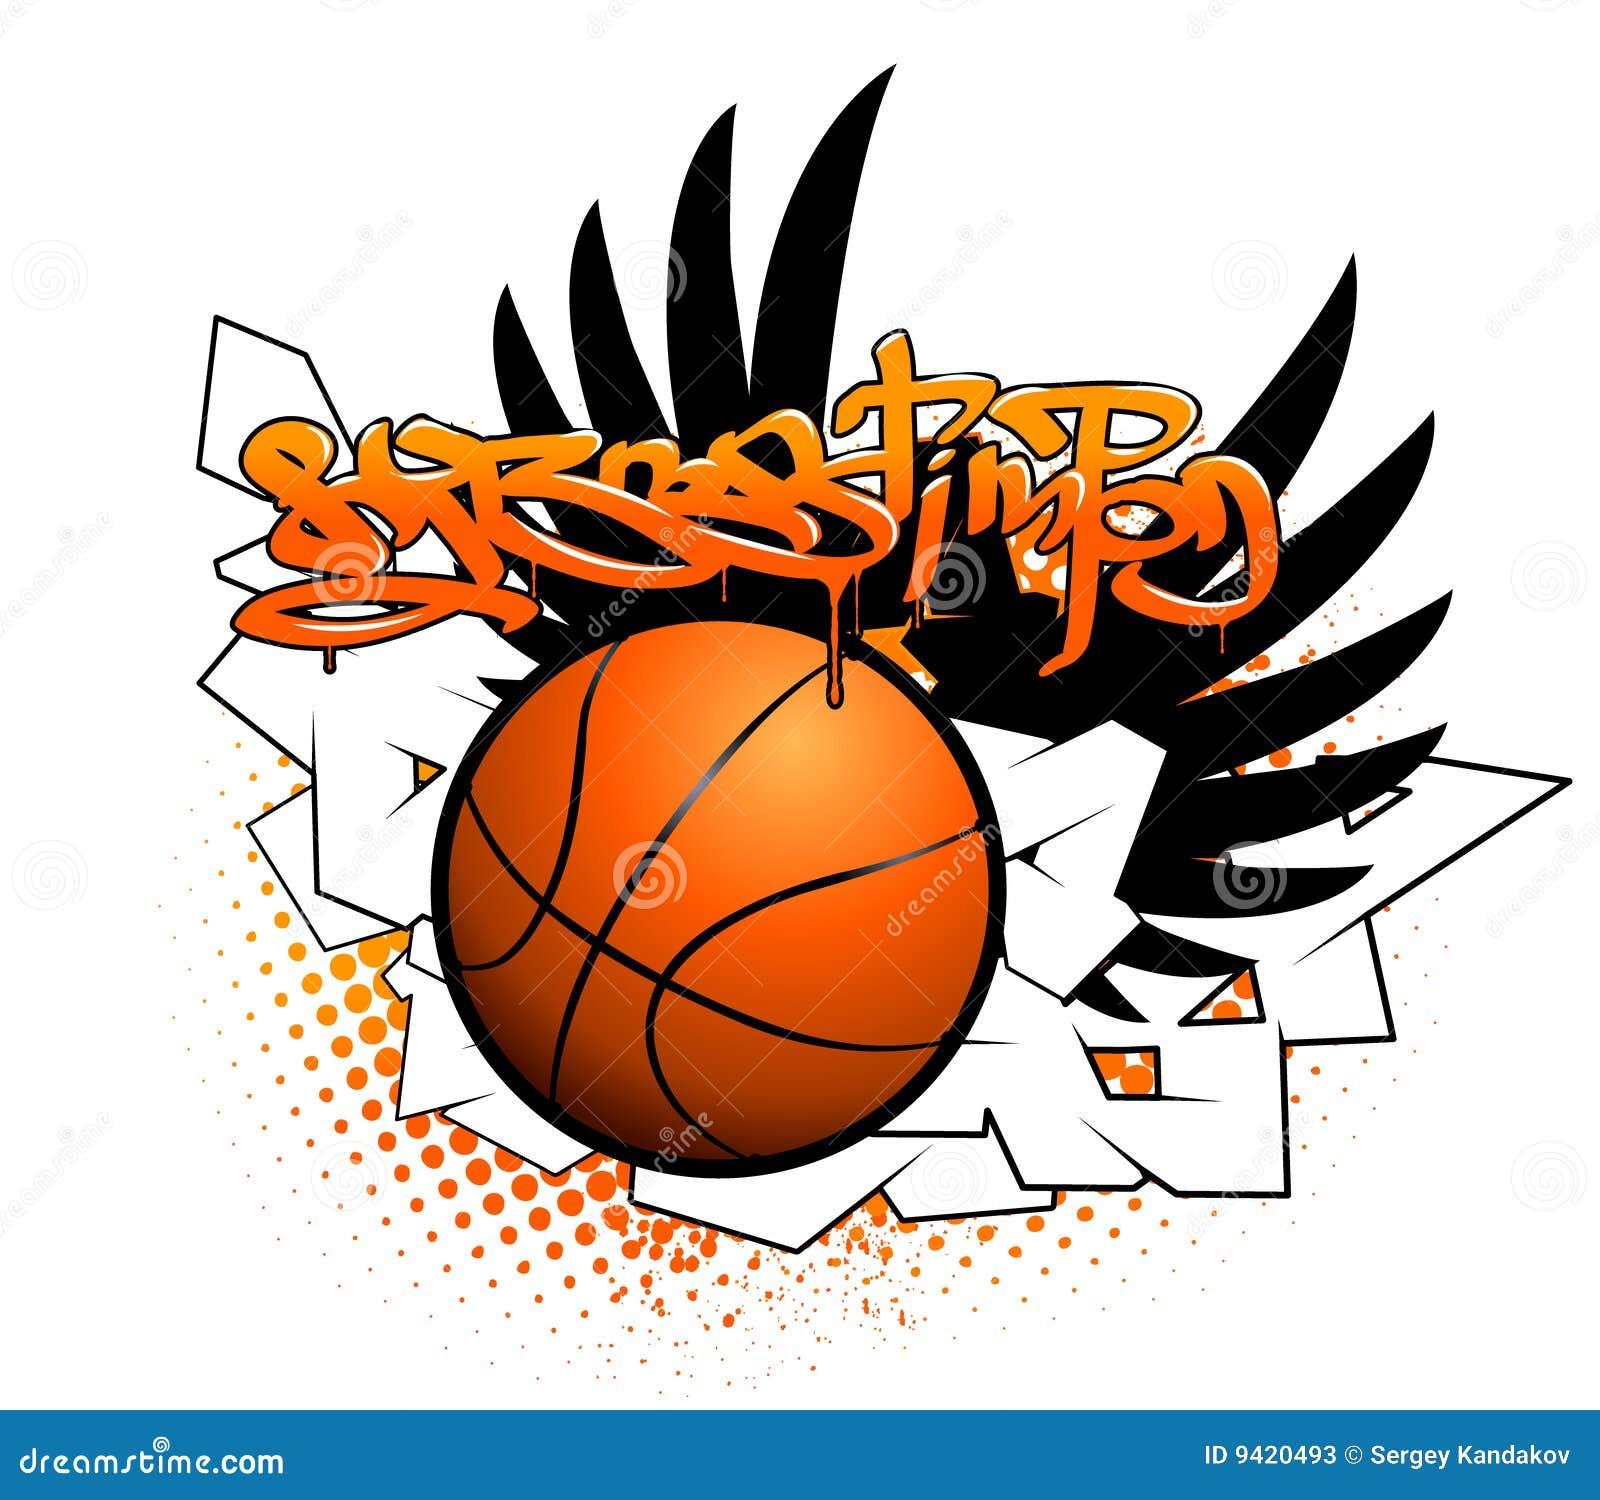 nba team logos wallpaper 3d